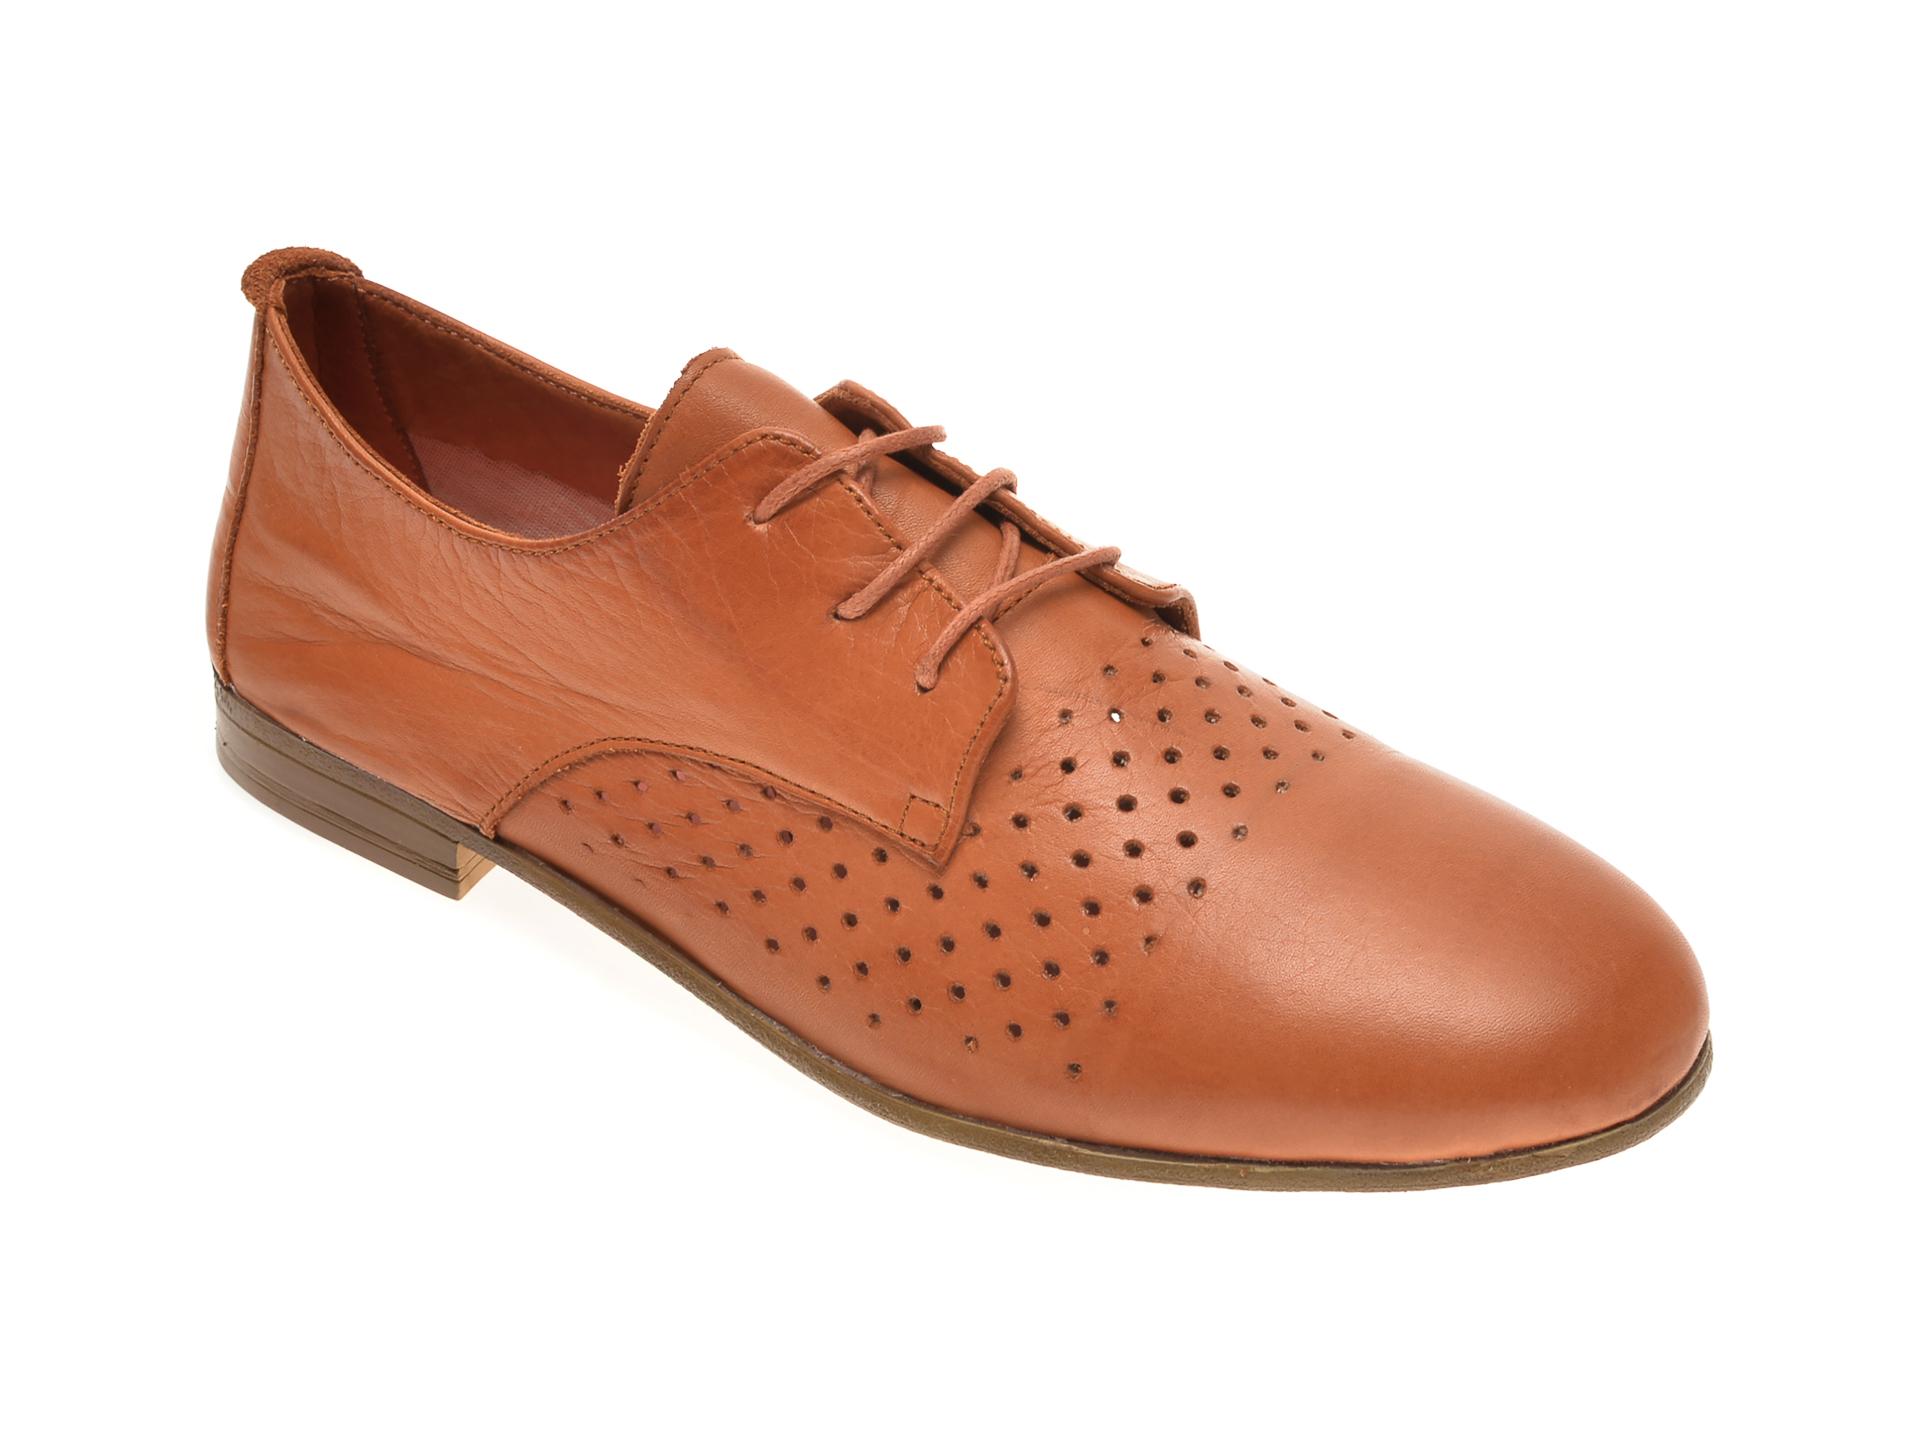 Pantofi BABOOS maro, 1106, din piele naturala